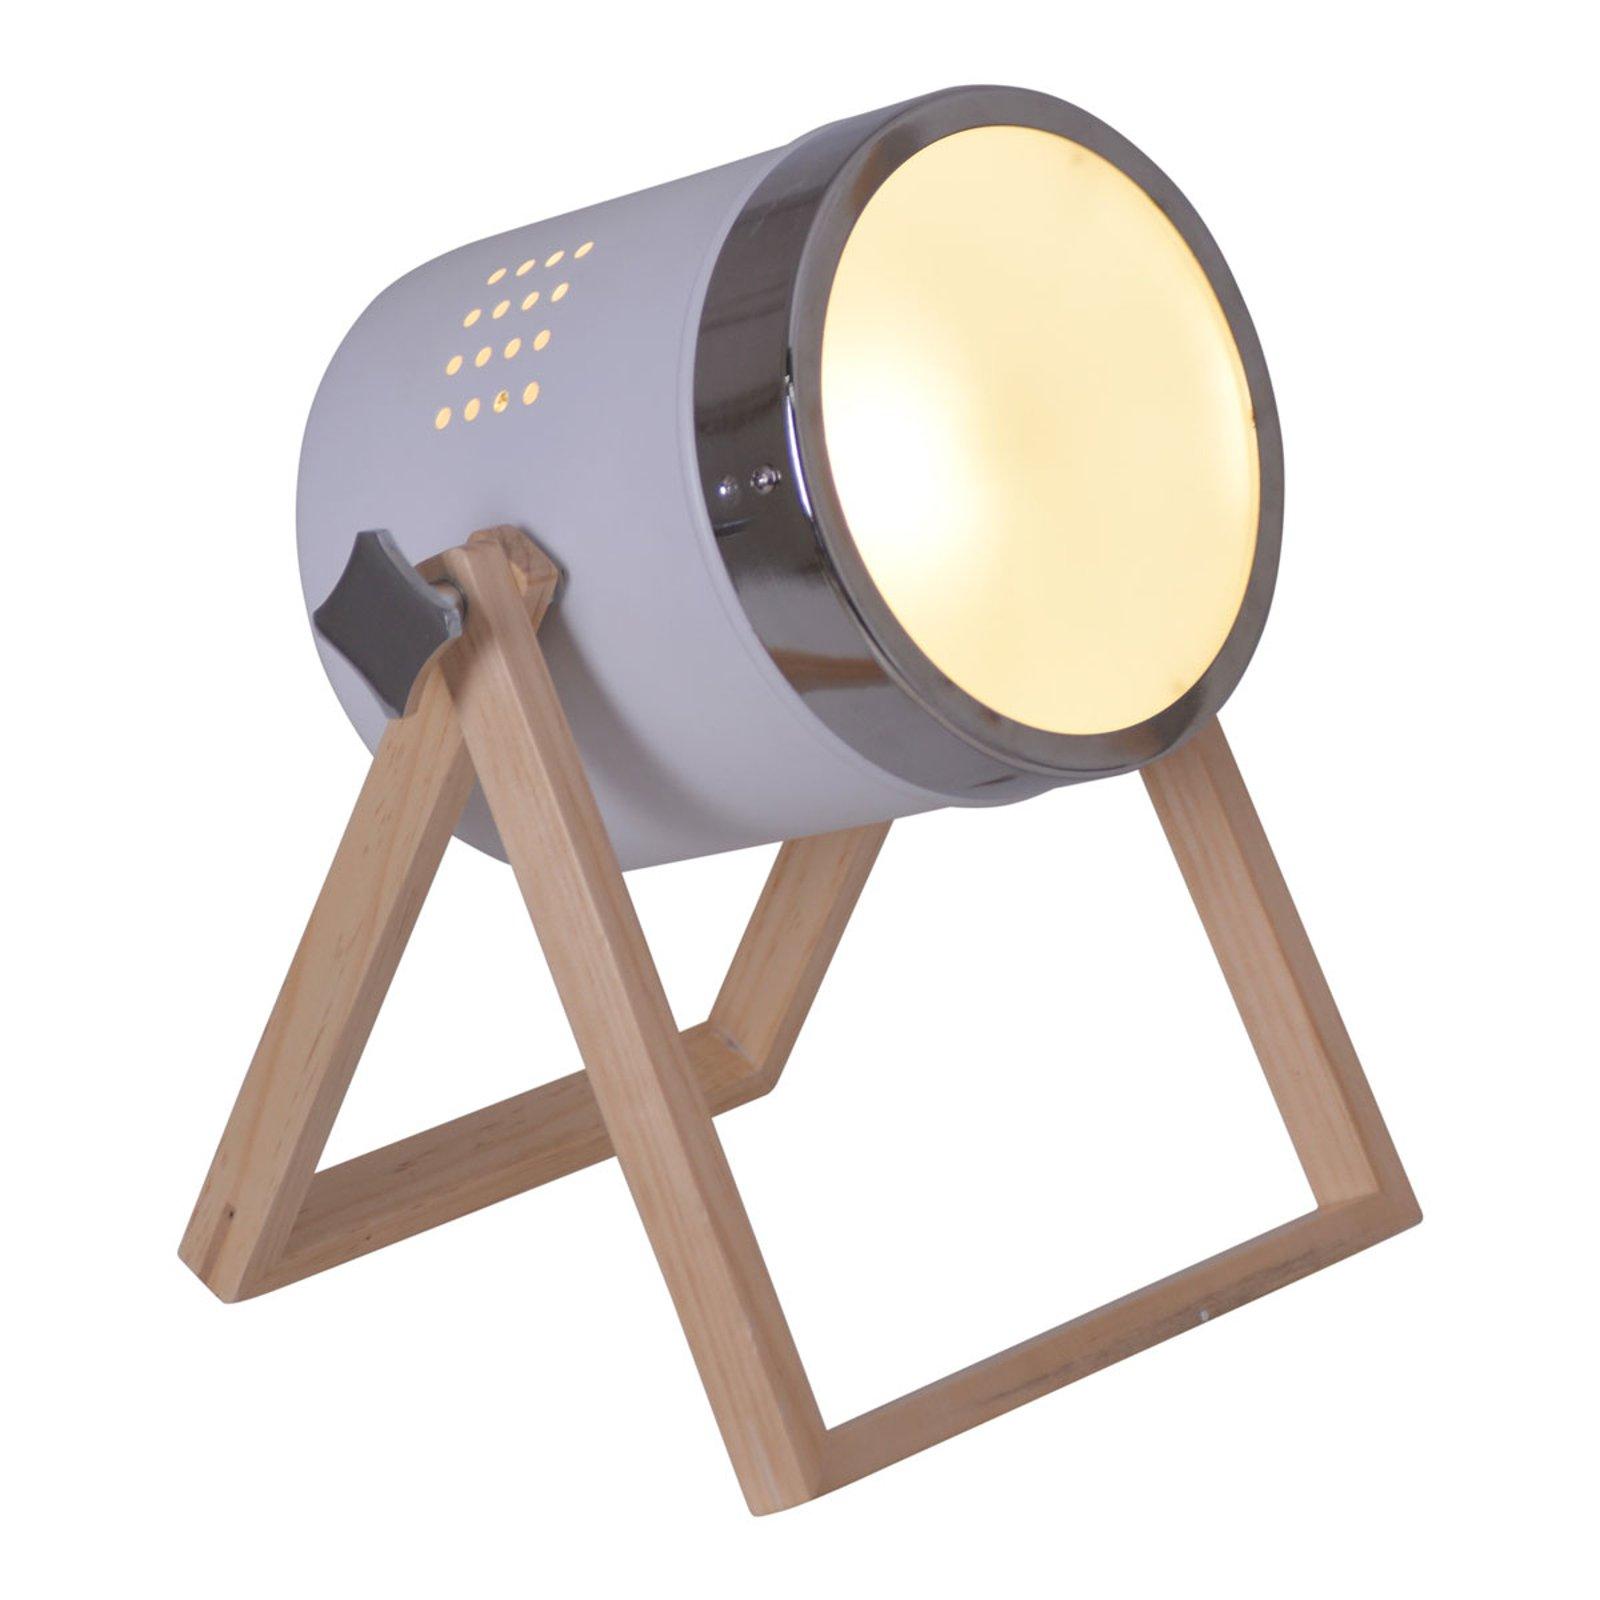 Bordlampe Tim hvit, sølv